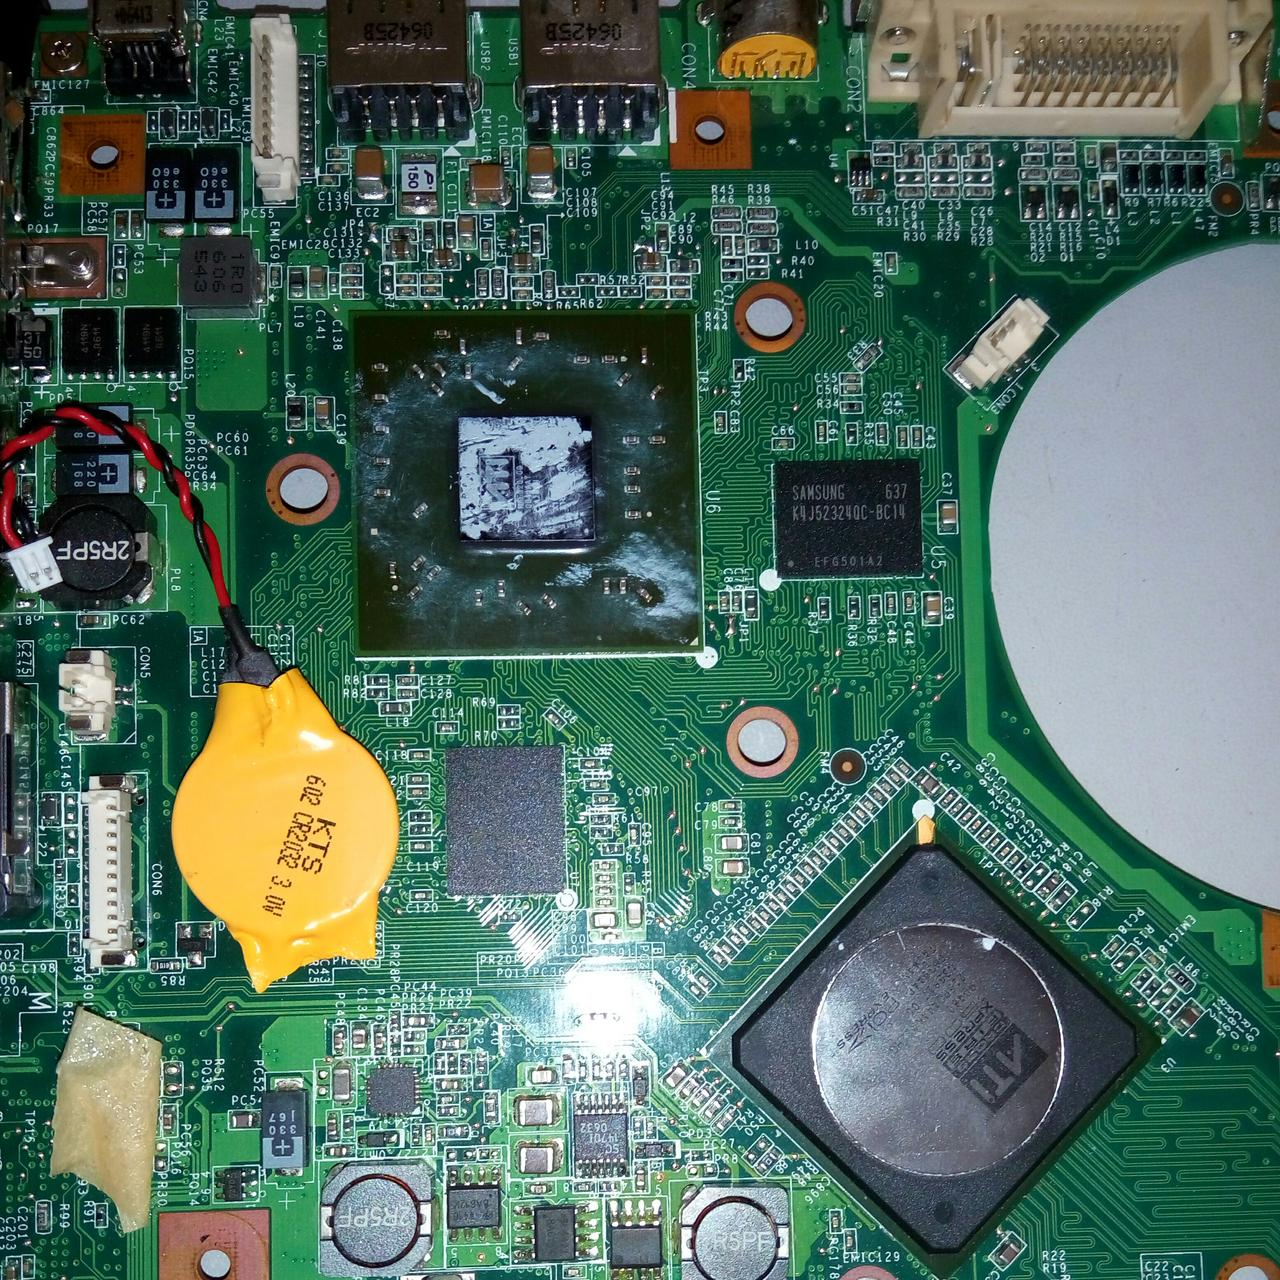 MSI M655X WINDOWS 7 X64 TREIBER